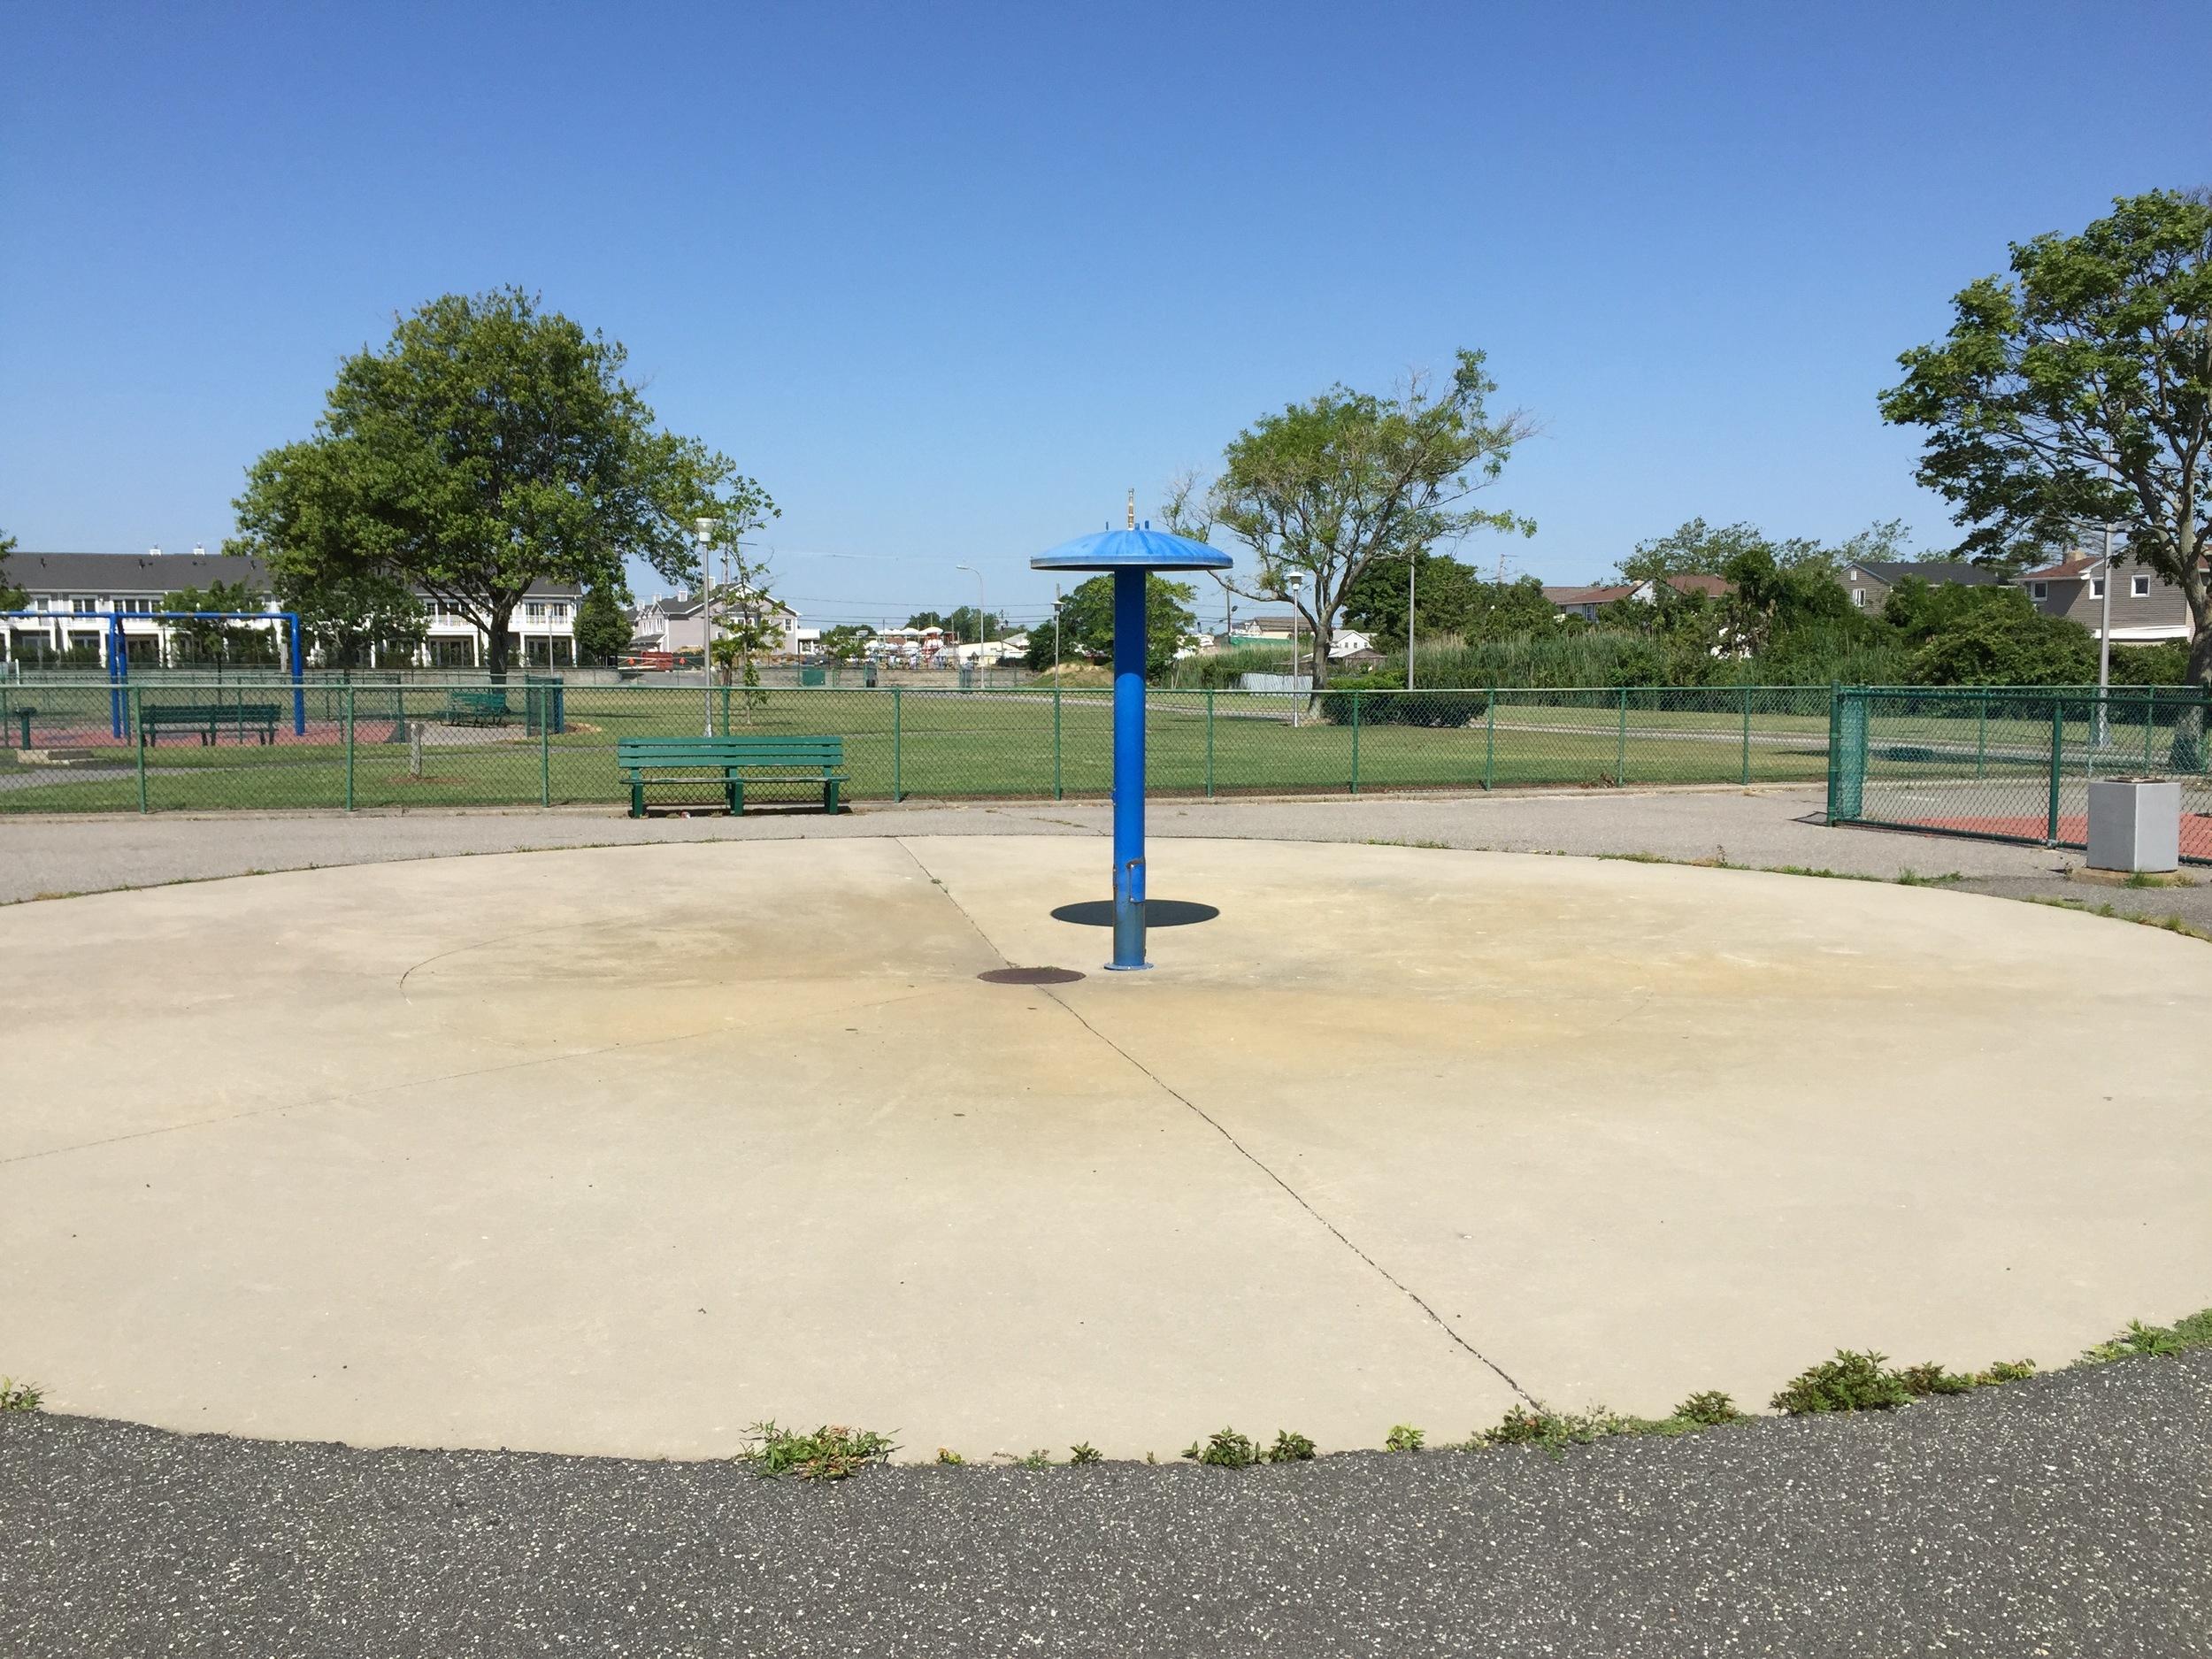 Sprayground at Cow Meadow Park